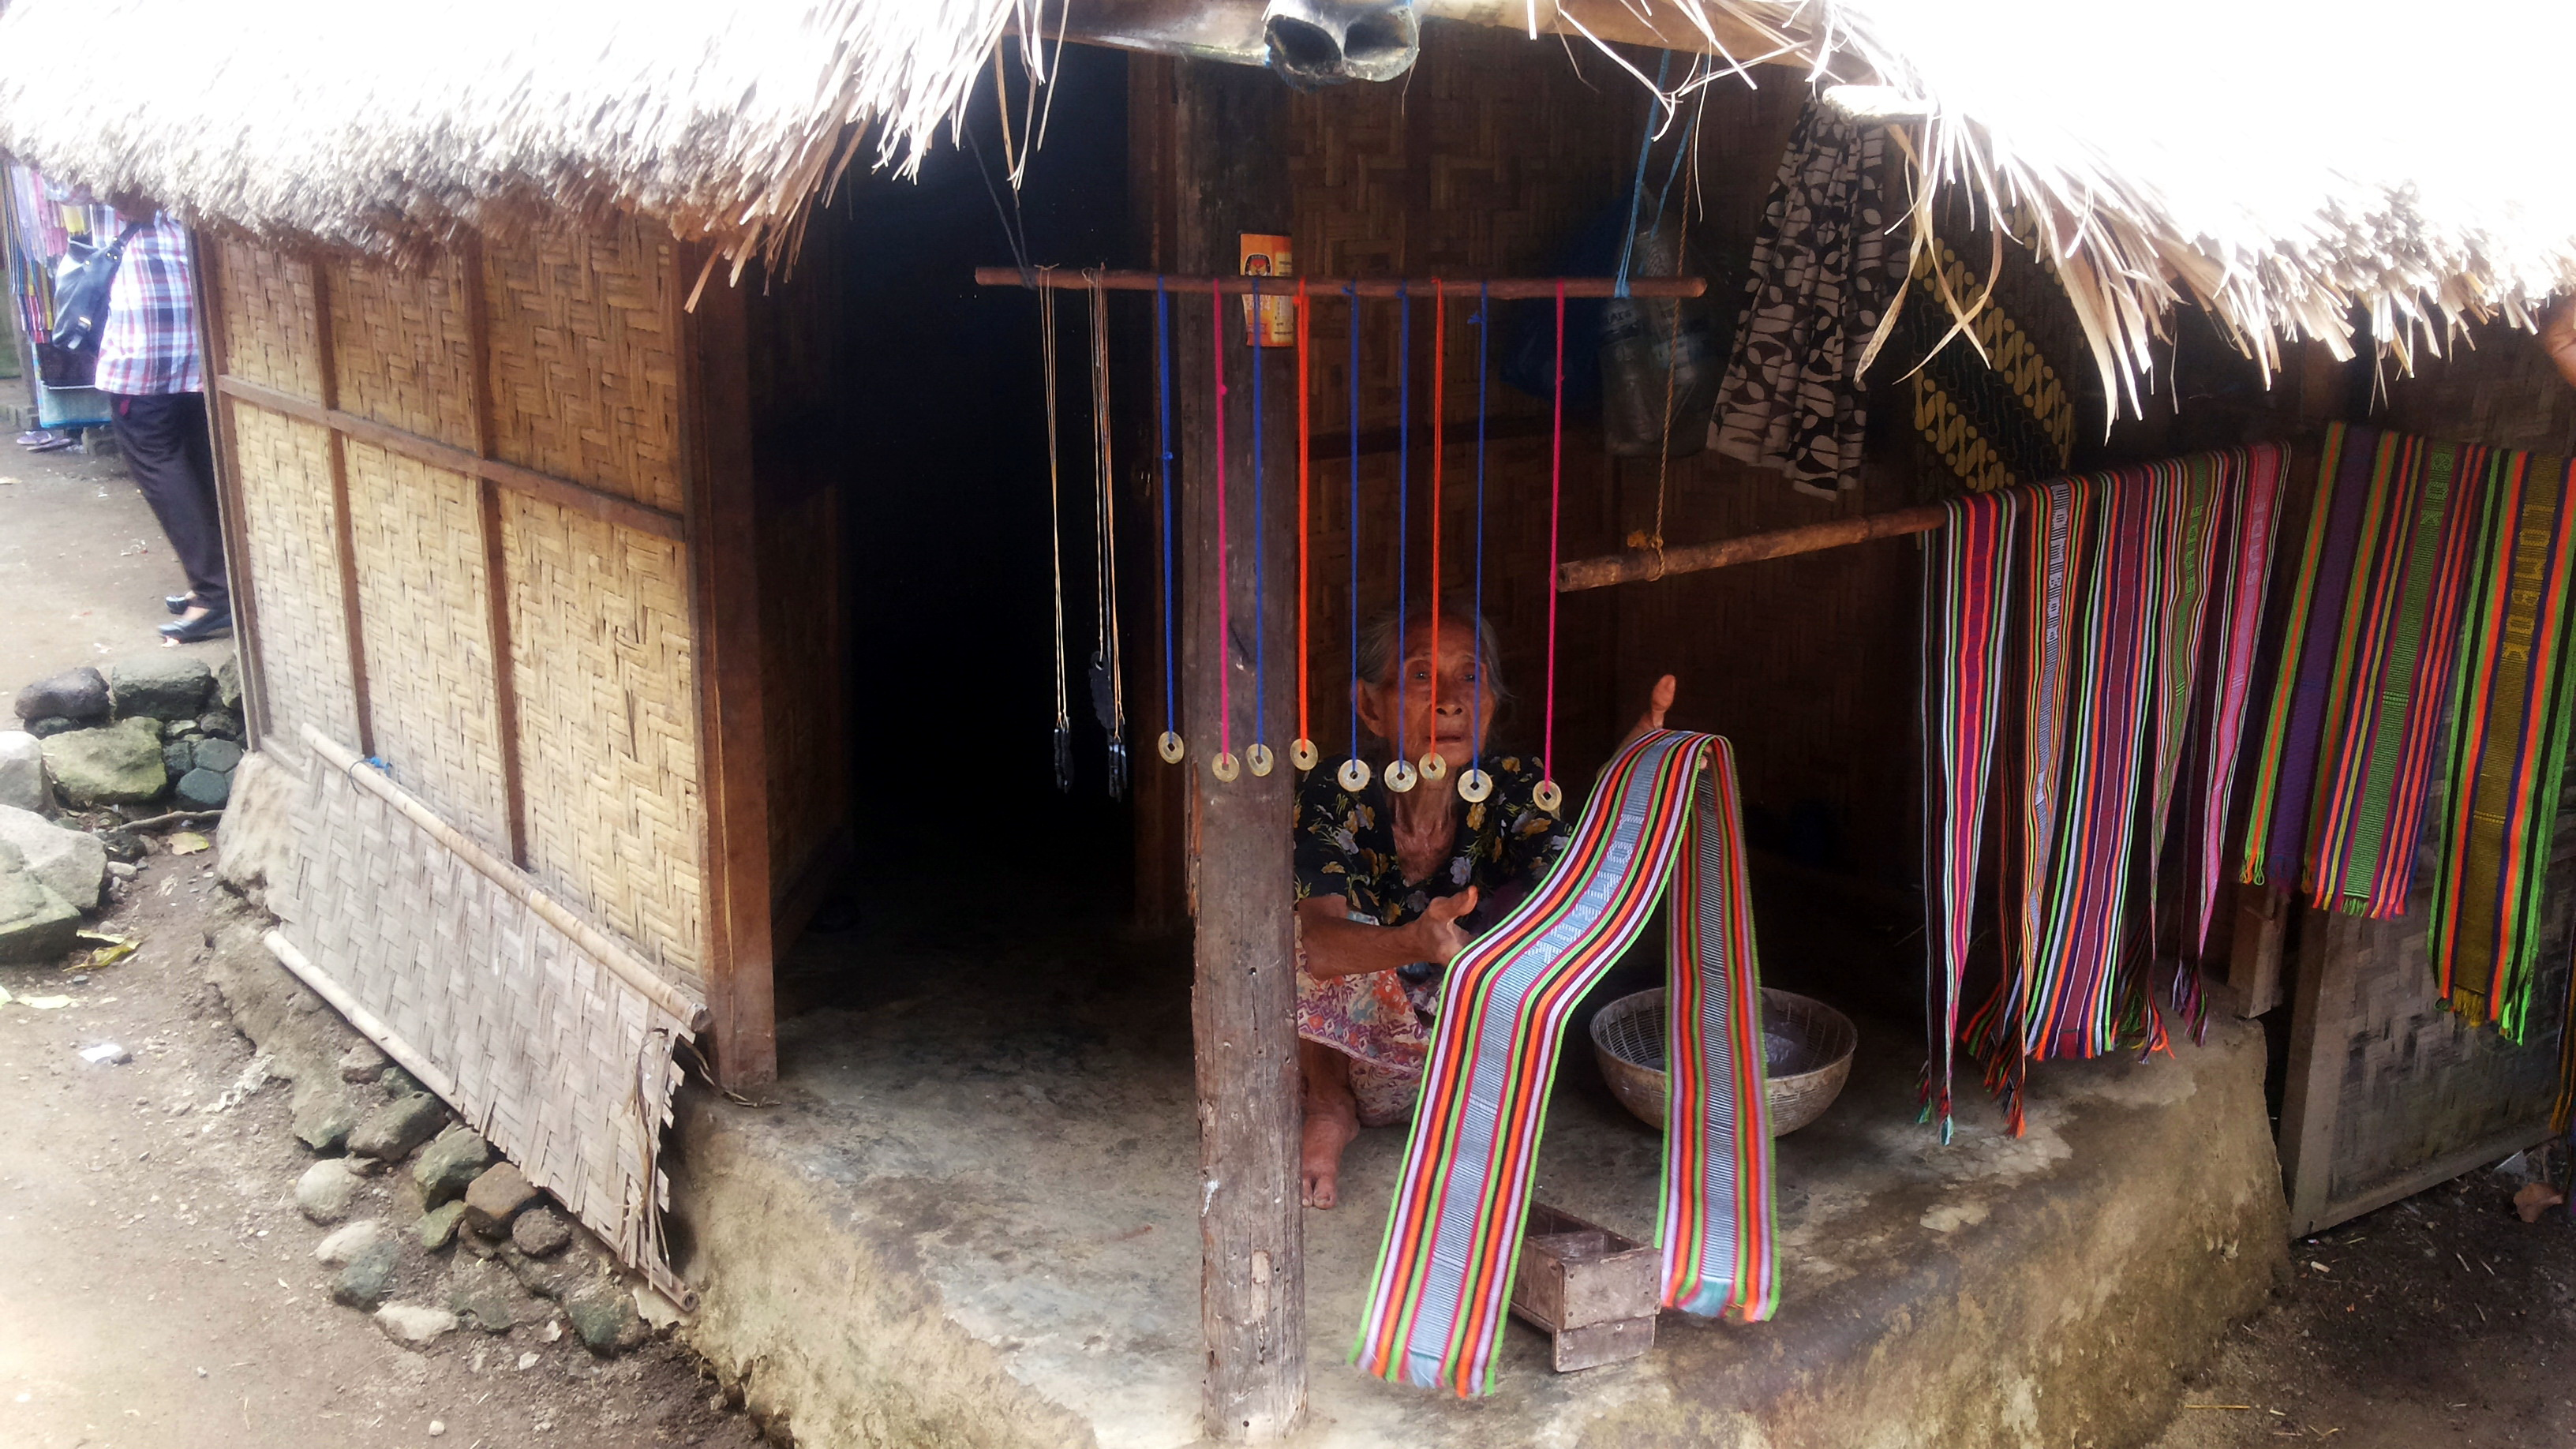 Kenali Suku Sasak di Desa Sade, Lombok - Foto 2